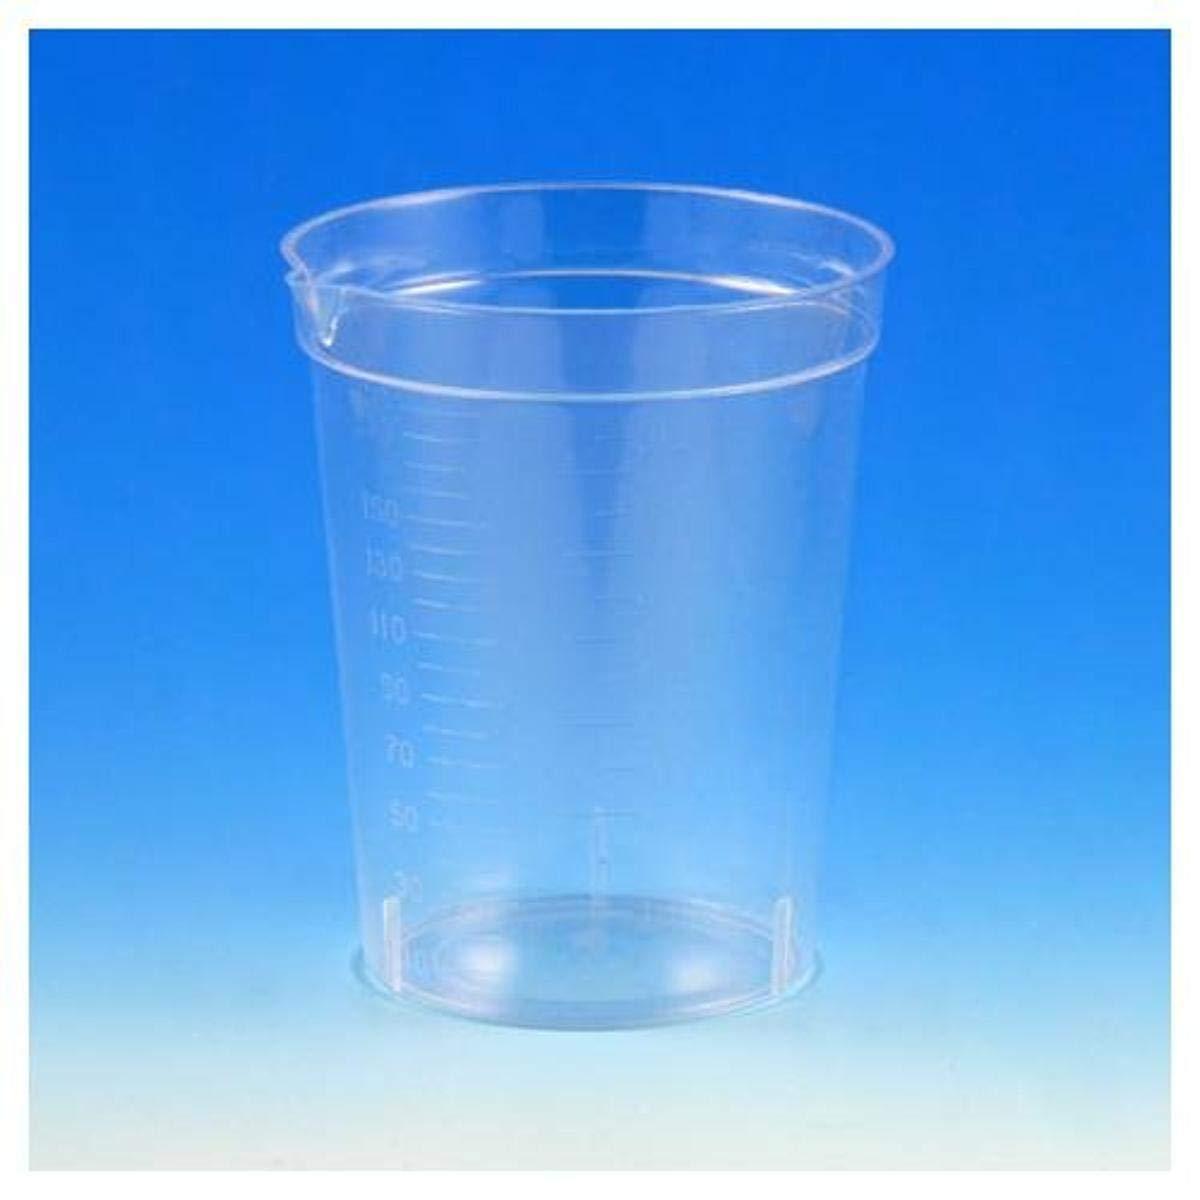 Globe Scientific 5921 Specimen Container 6.5 Baltimore Mall Spout ozwith Max 85% OFF Pour